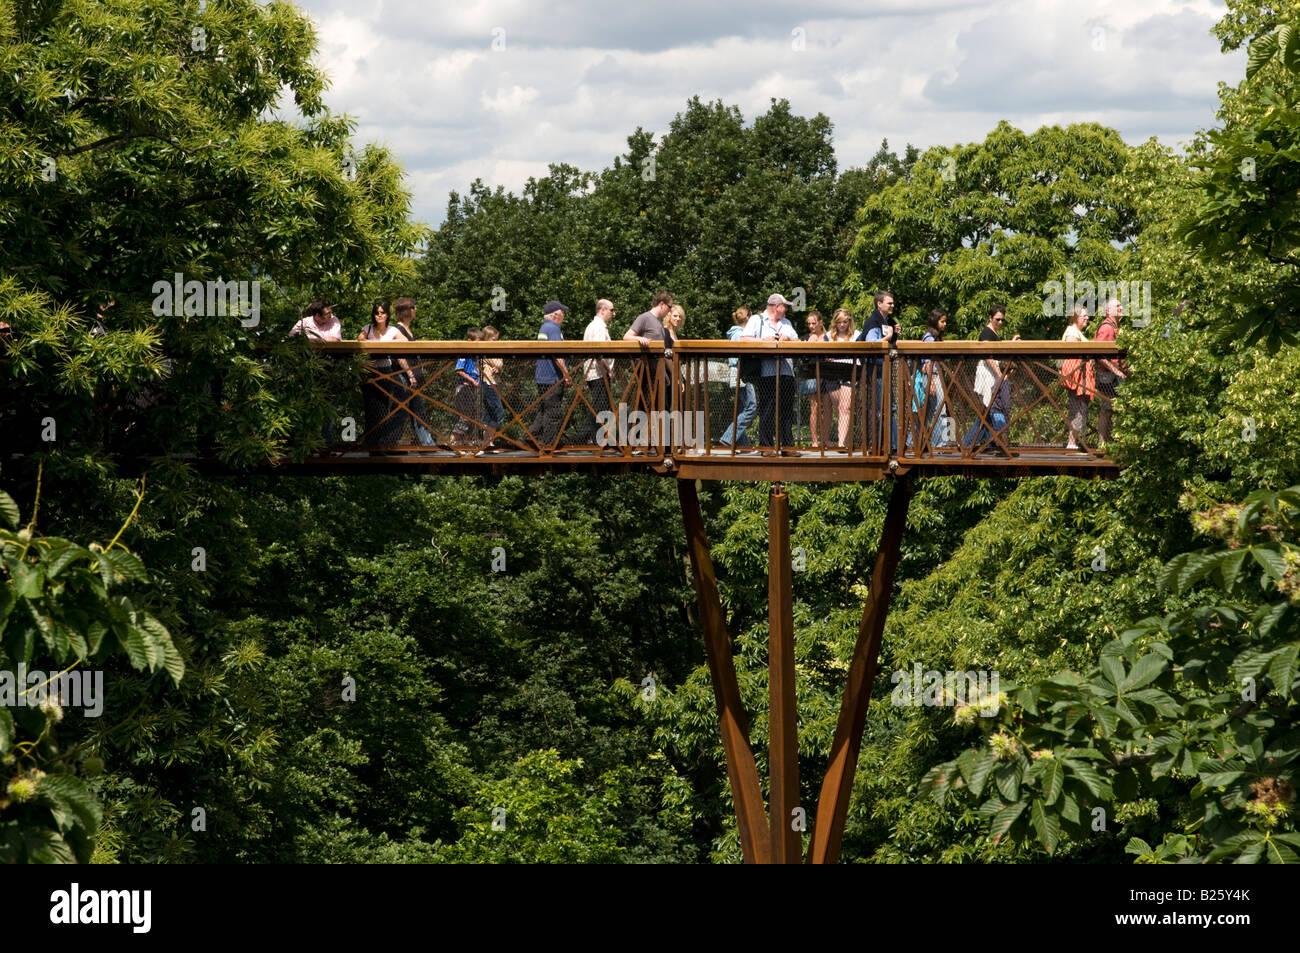 Xstrata Treetop Walkway at Kew Gardens, London, England UK - Stock Image